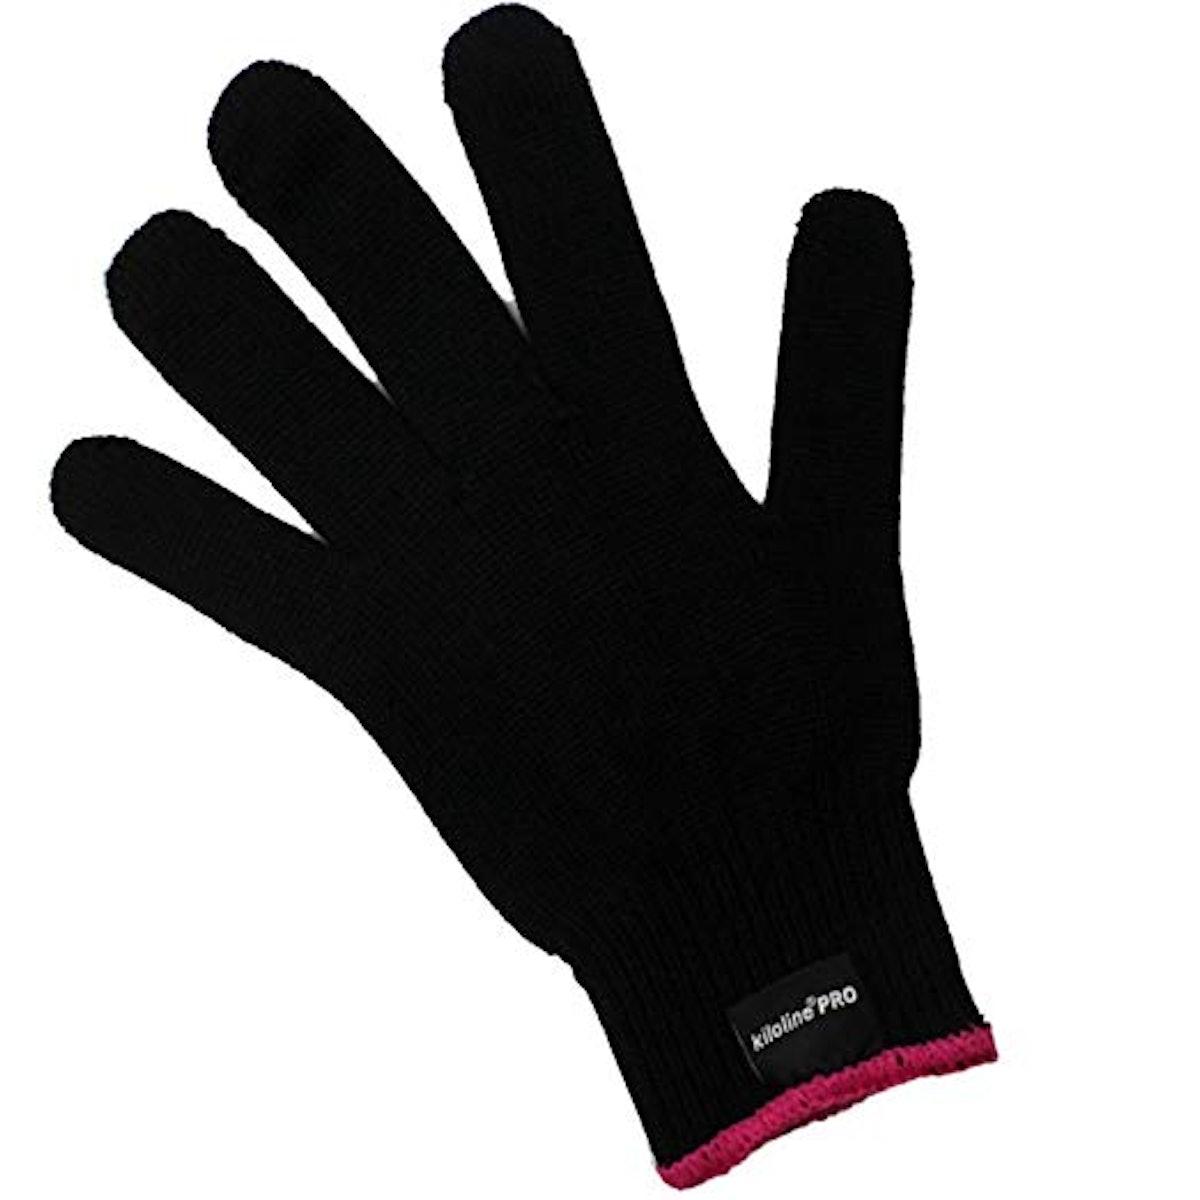 Kiloline Heat Resistant Glove